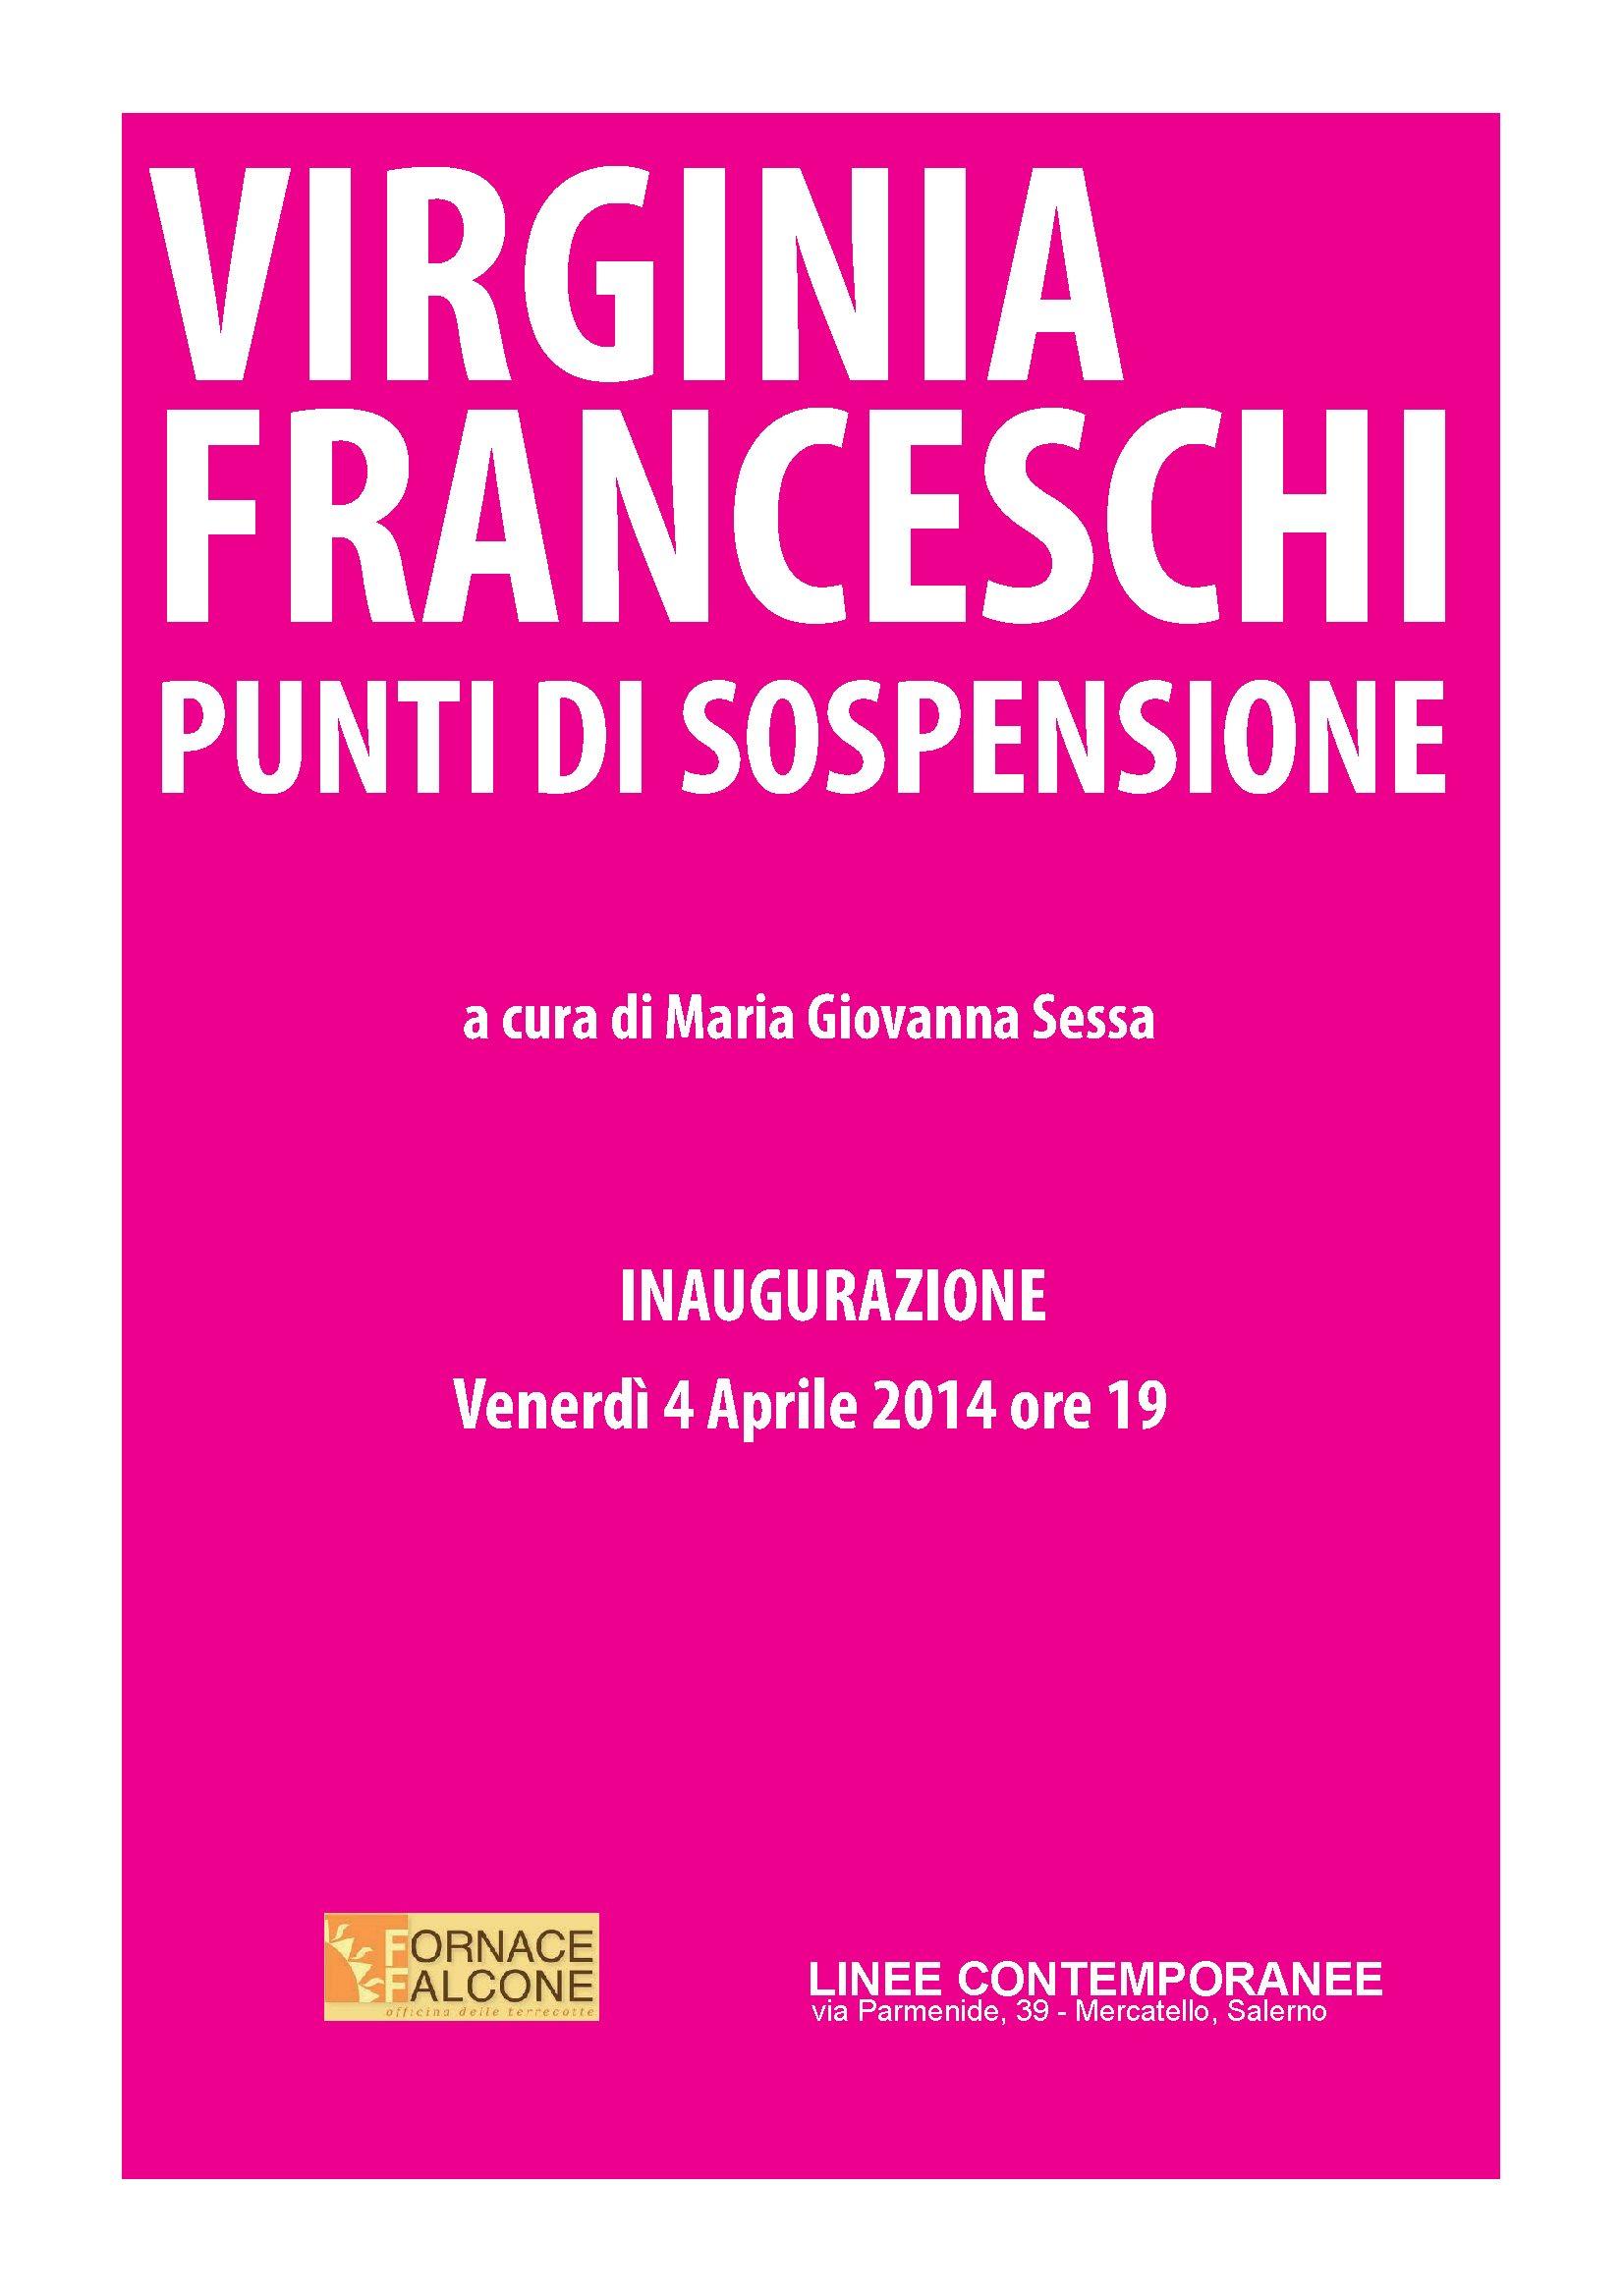 Virginia Franceschi